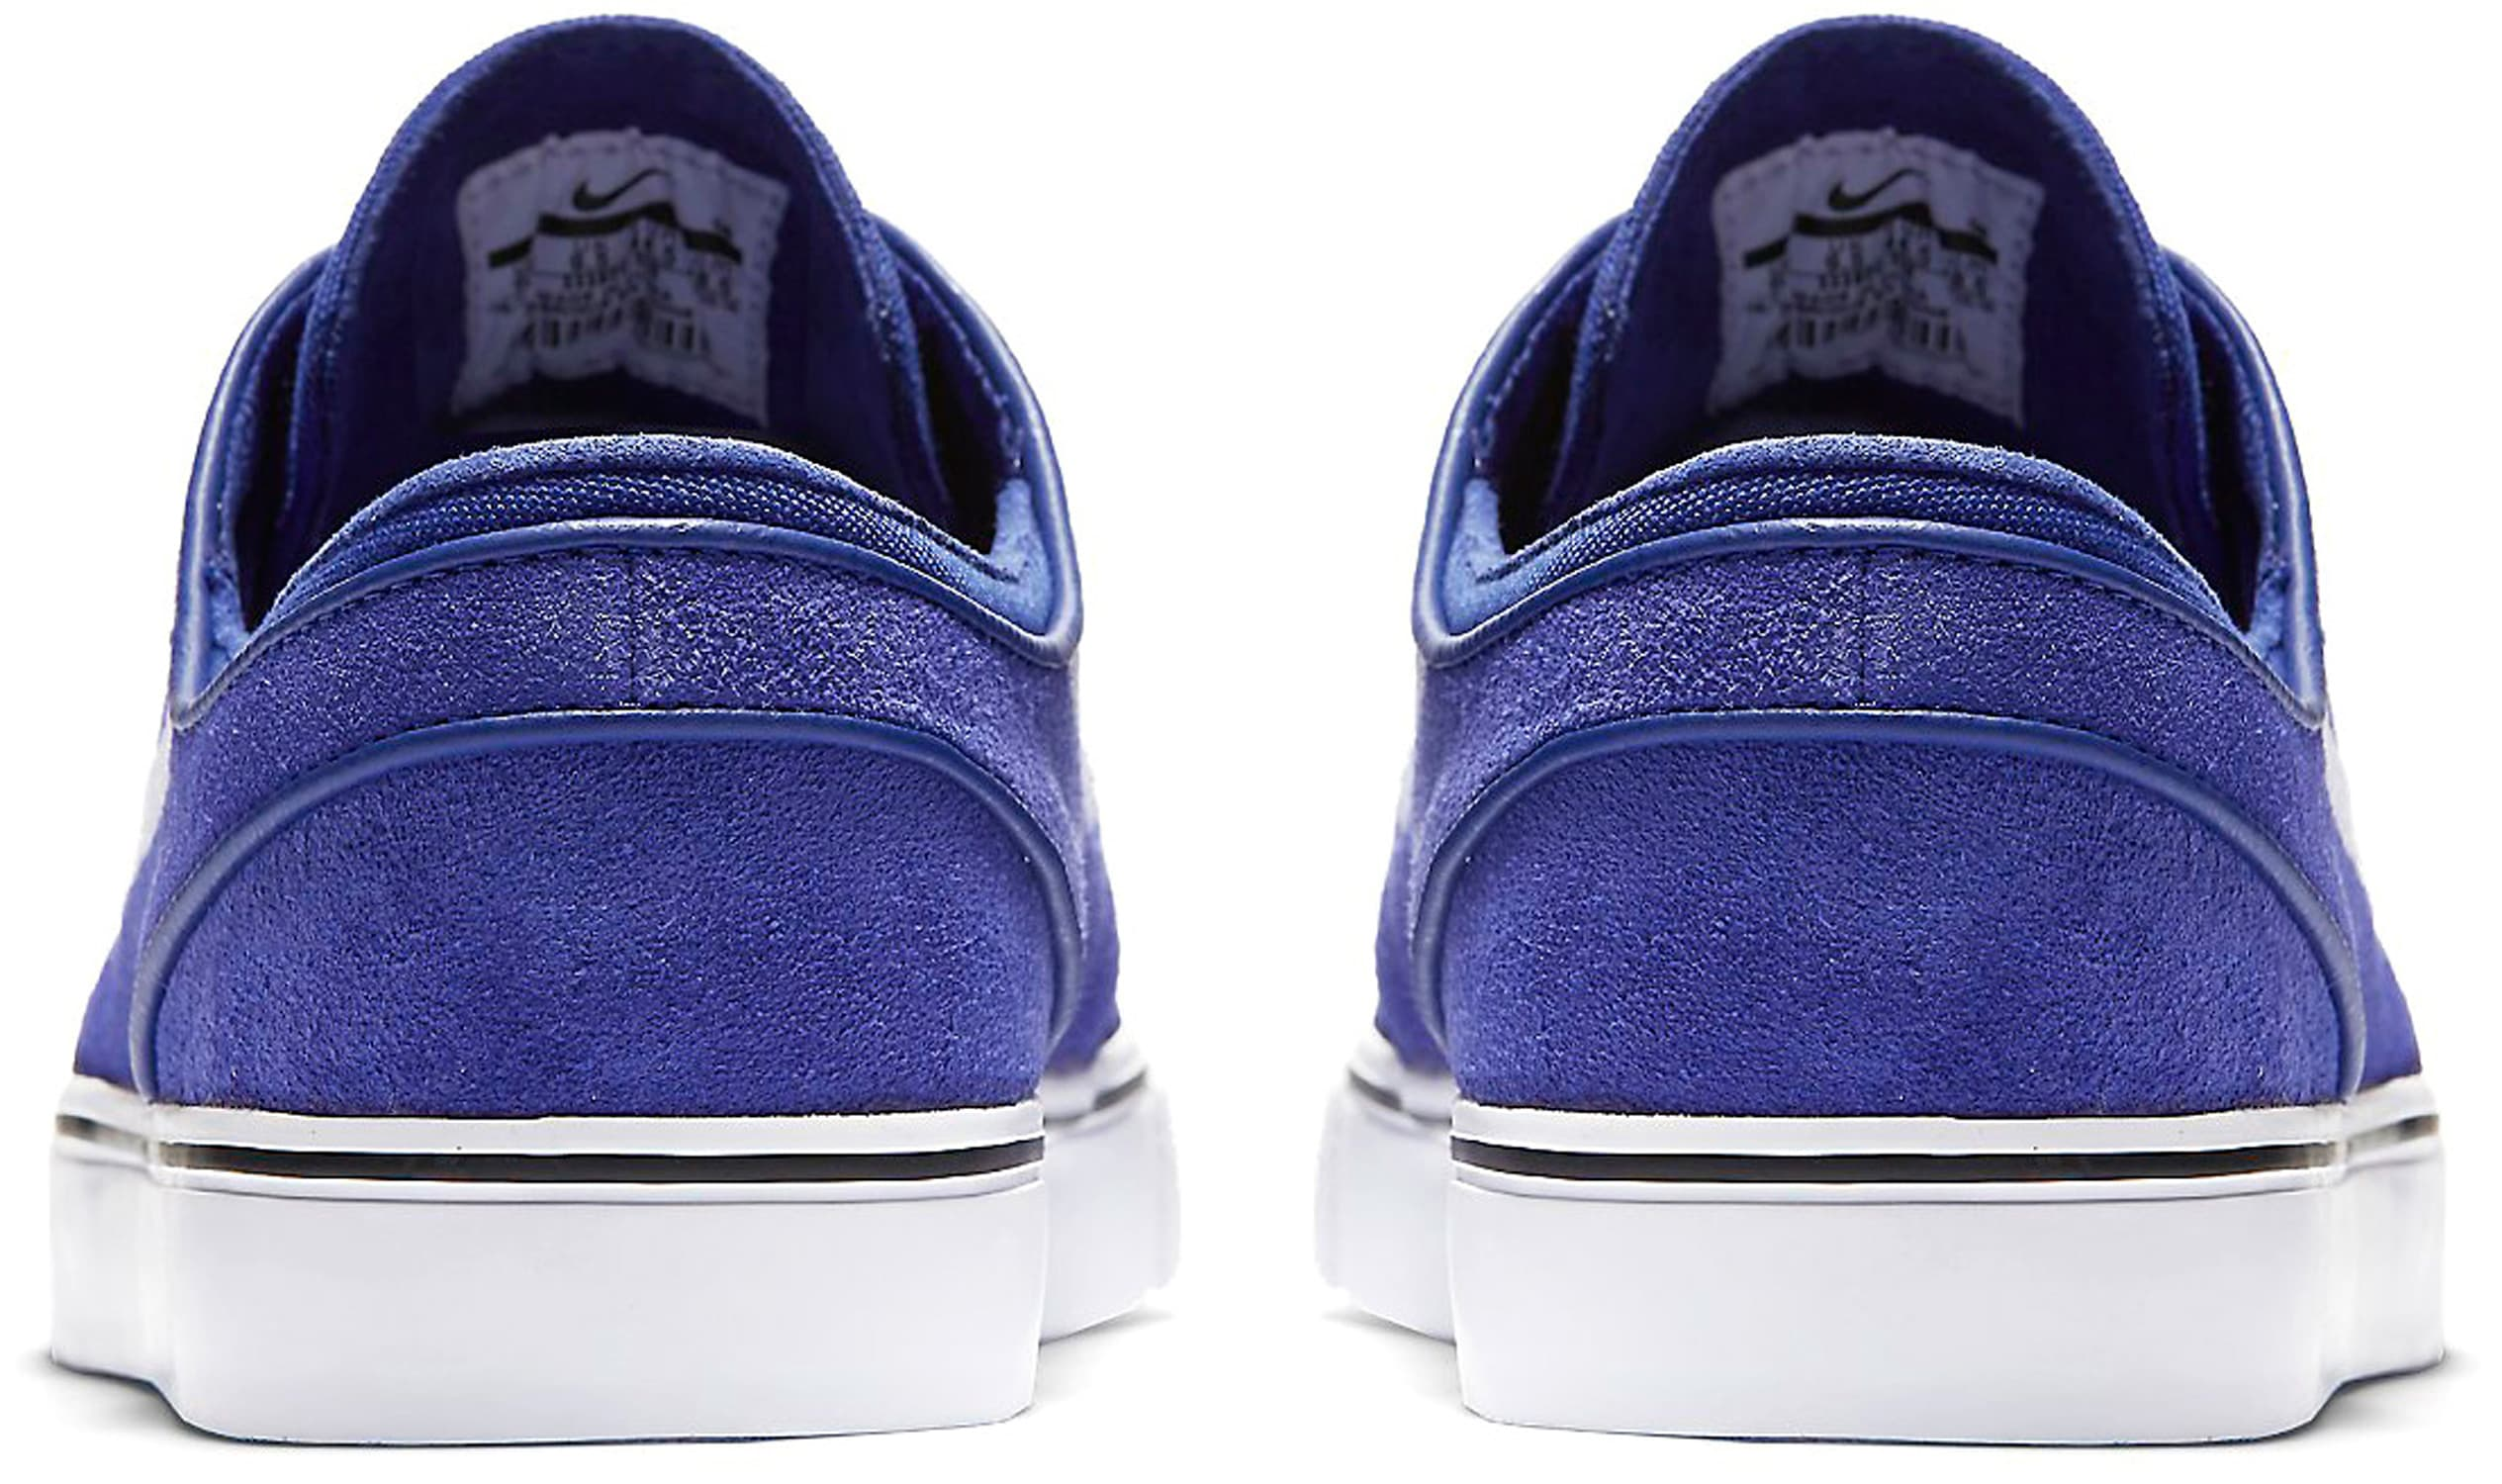 baee4149aff7 Nike SB Zoom Stefan Janoski Skate Shoes - thumbnail 5